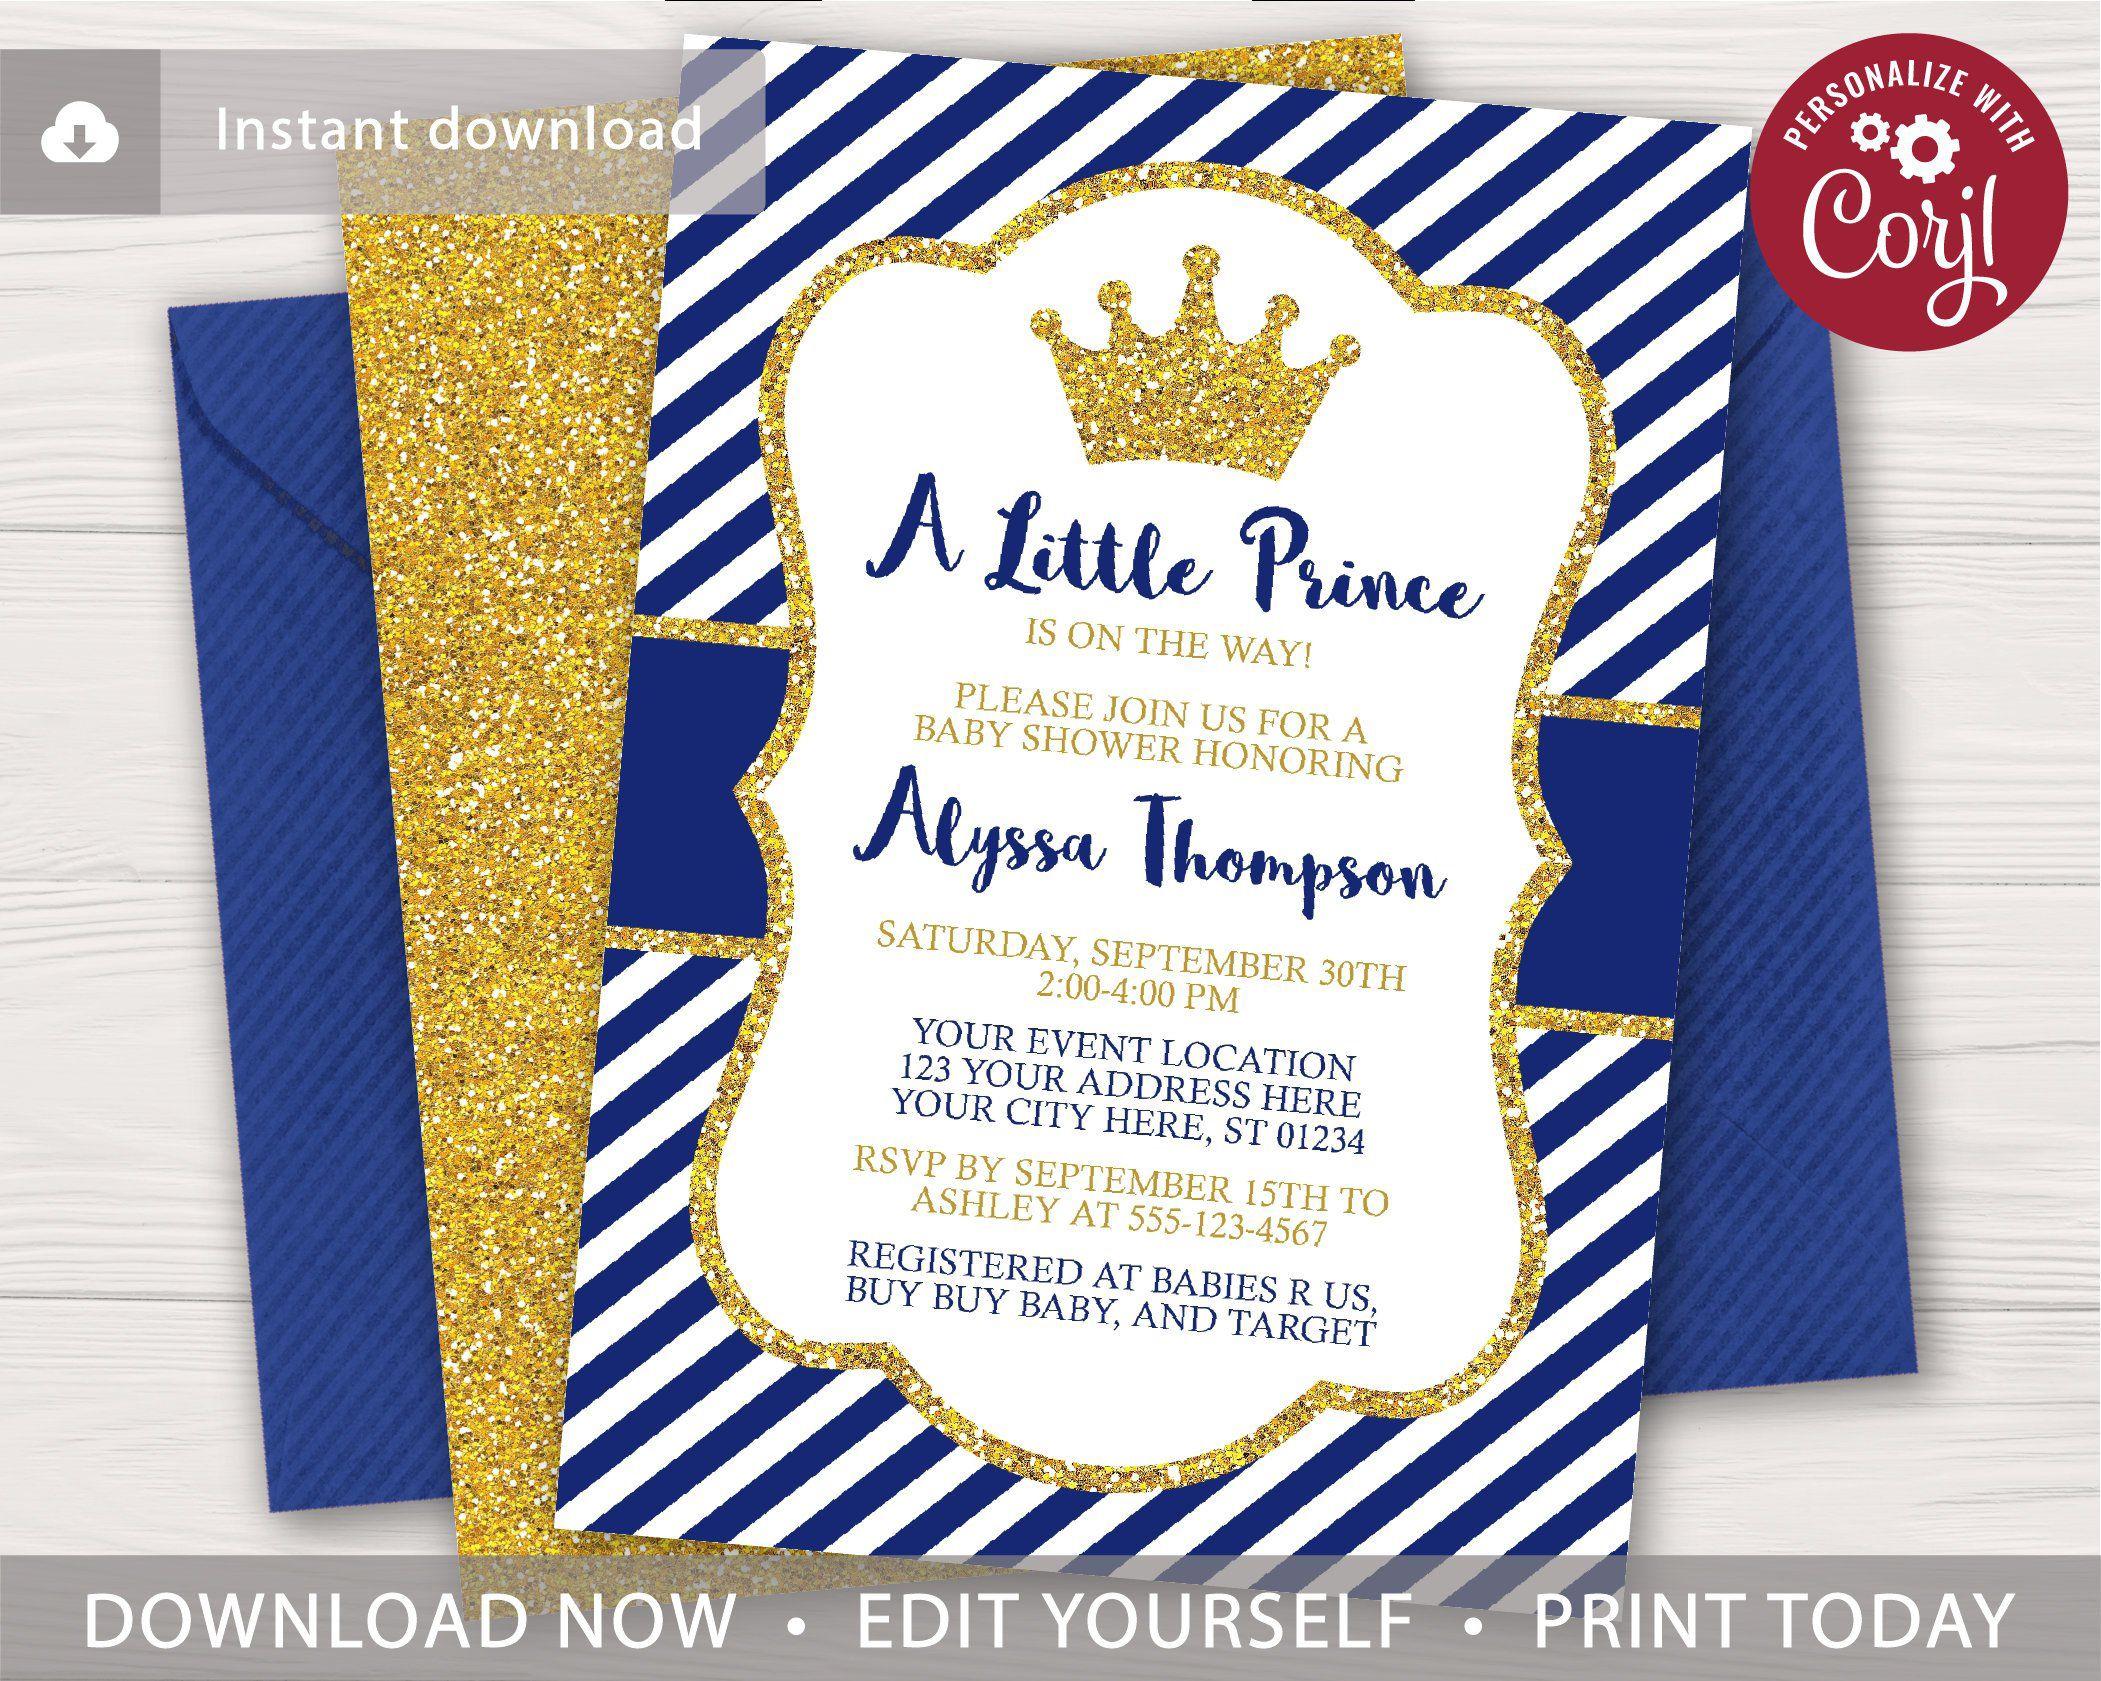 Prince Baby Shower Invitation Editable Template Online Etsy Royal Baby Shower Invitation Prince Baby Shower Prince Baby Shower Invitations Royal baby shower invitation template